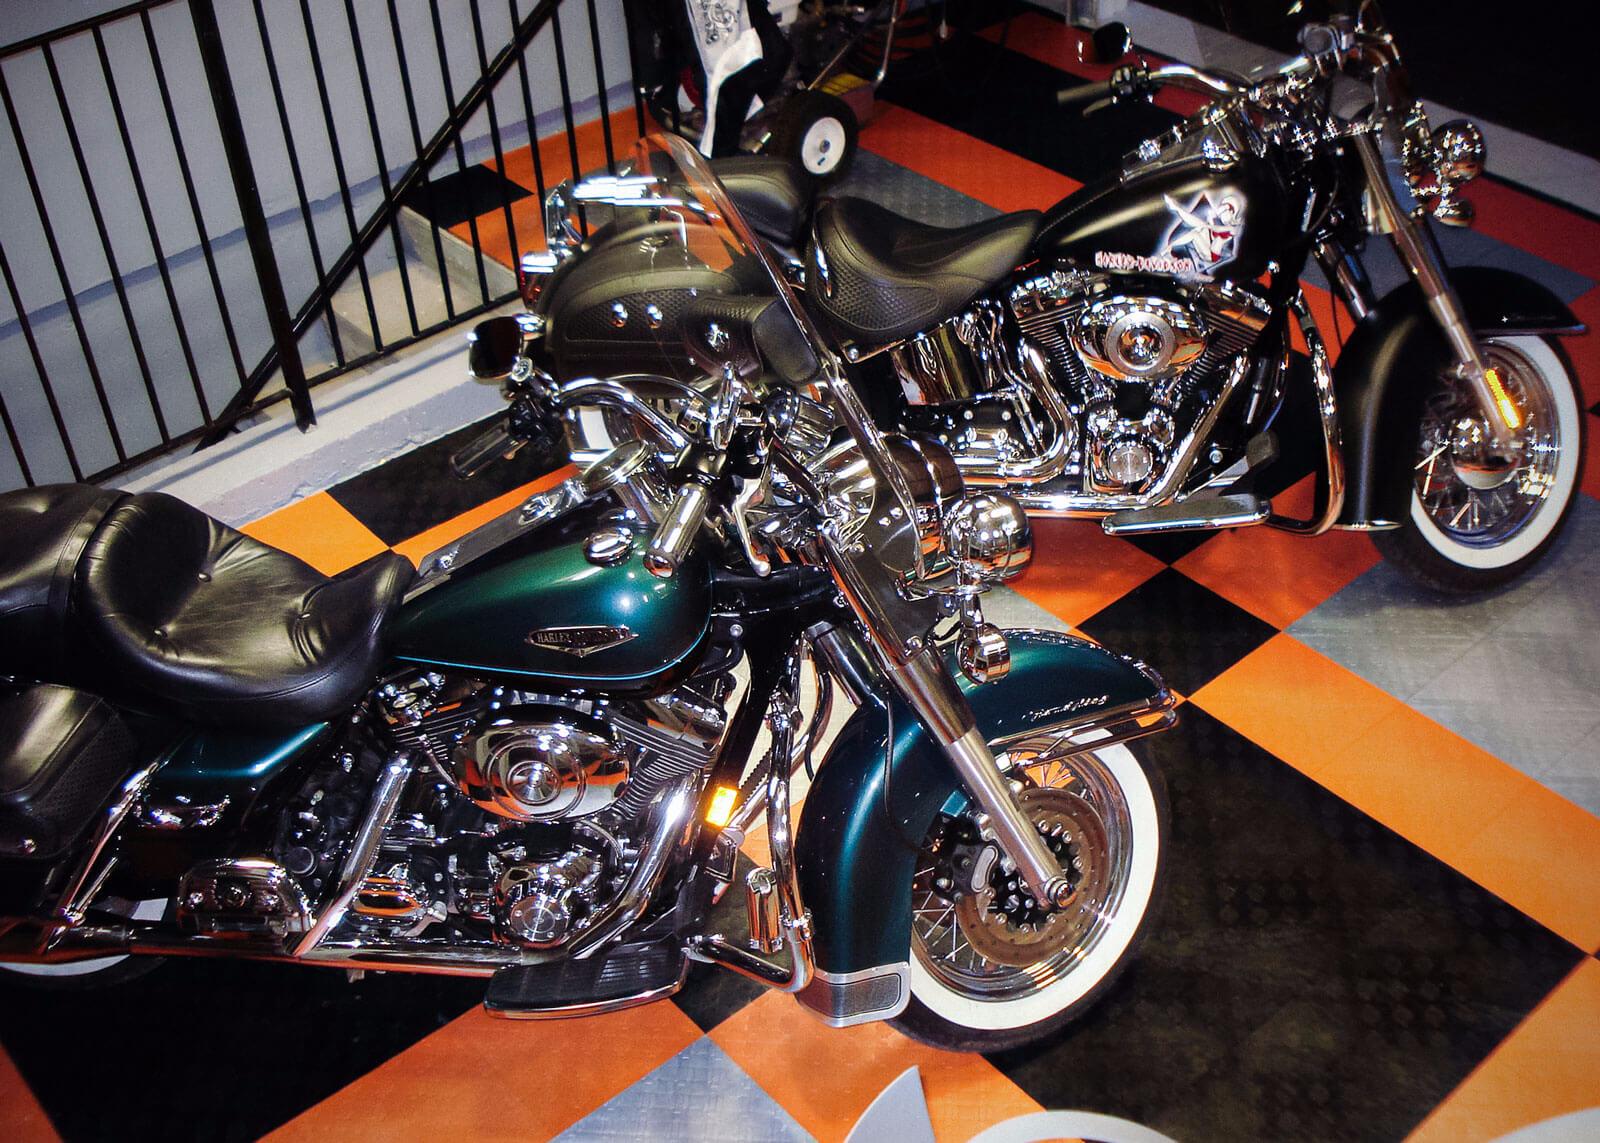 Harley color carpet tiles - Harley Davidson In Use